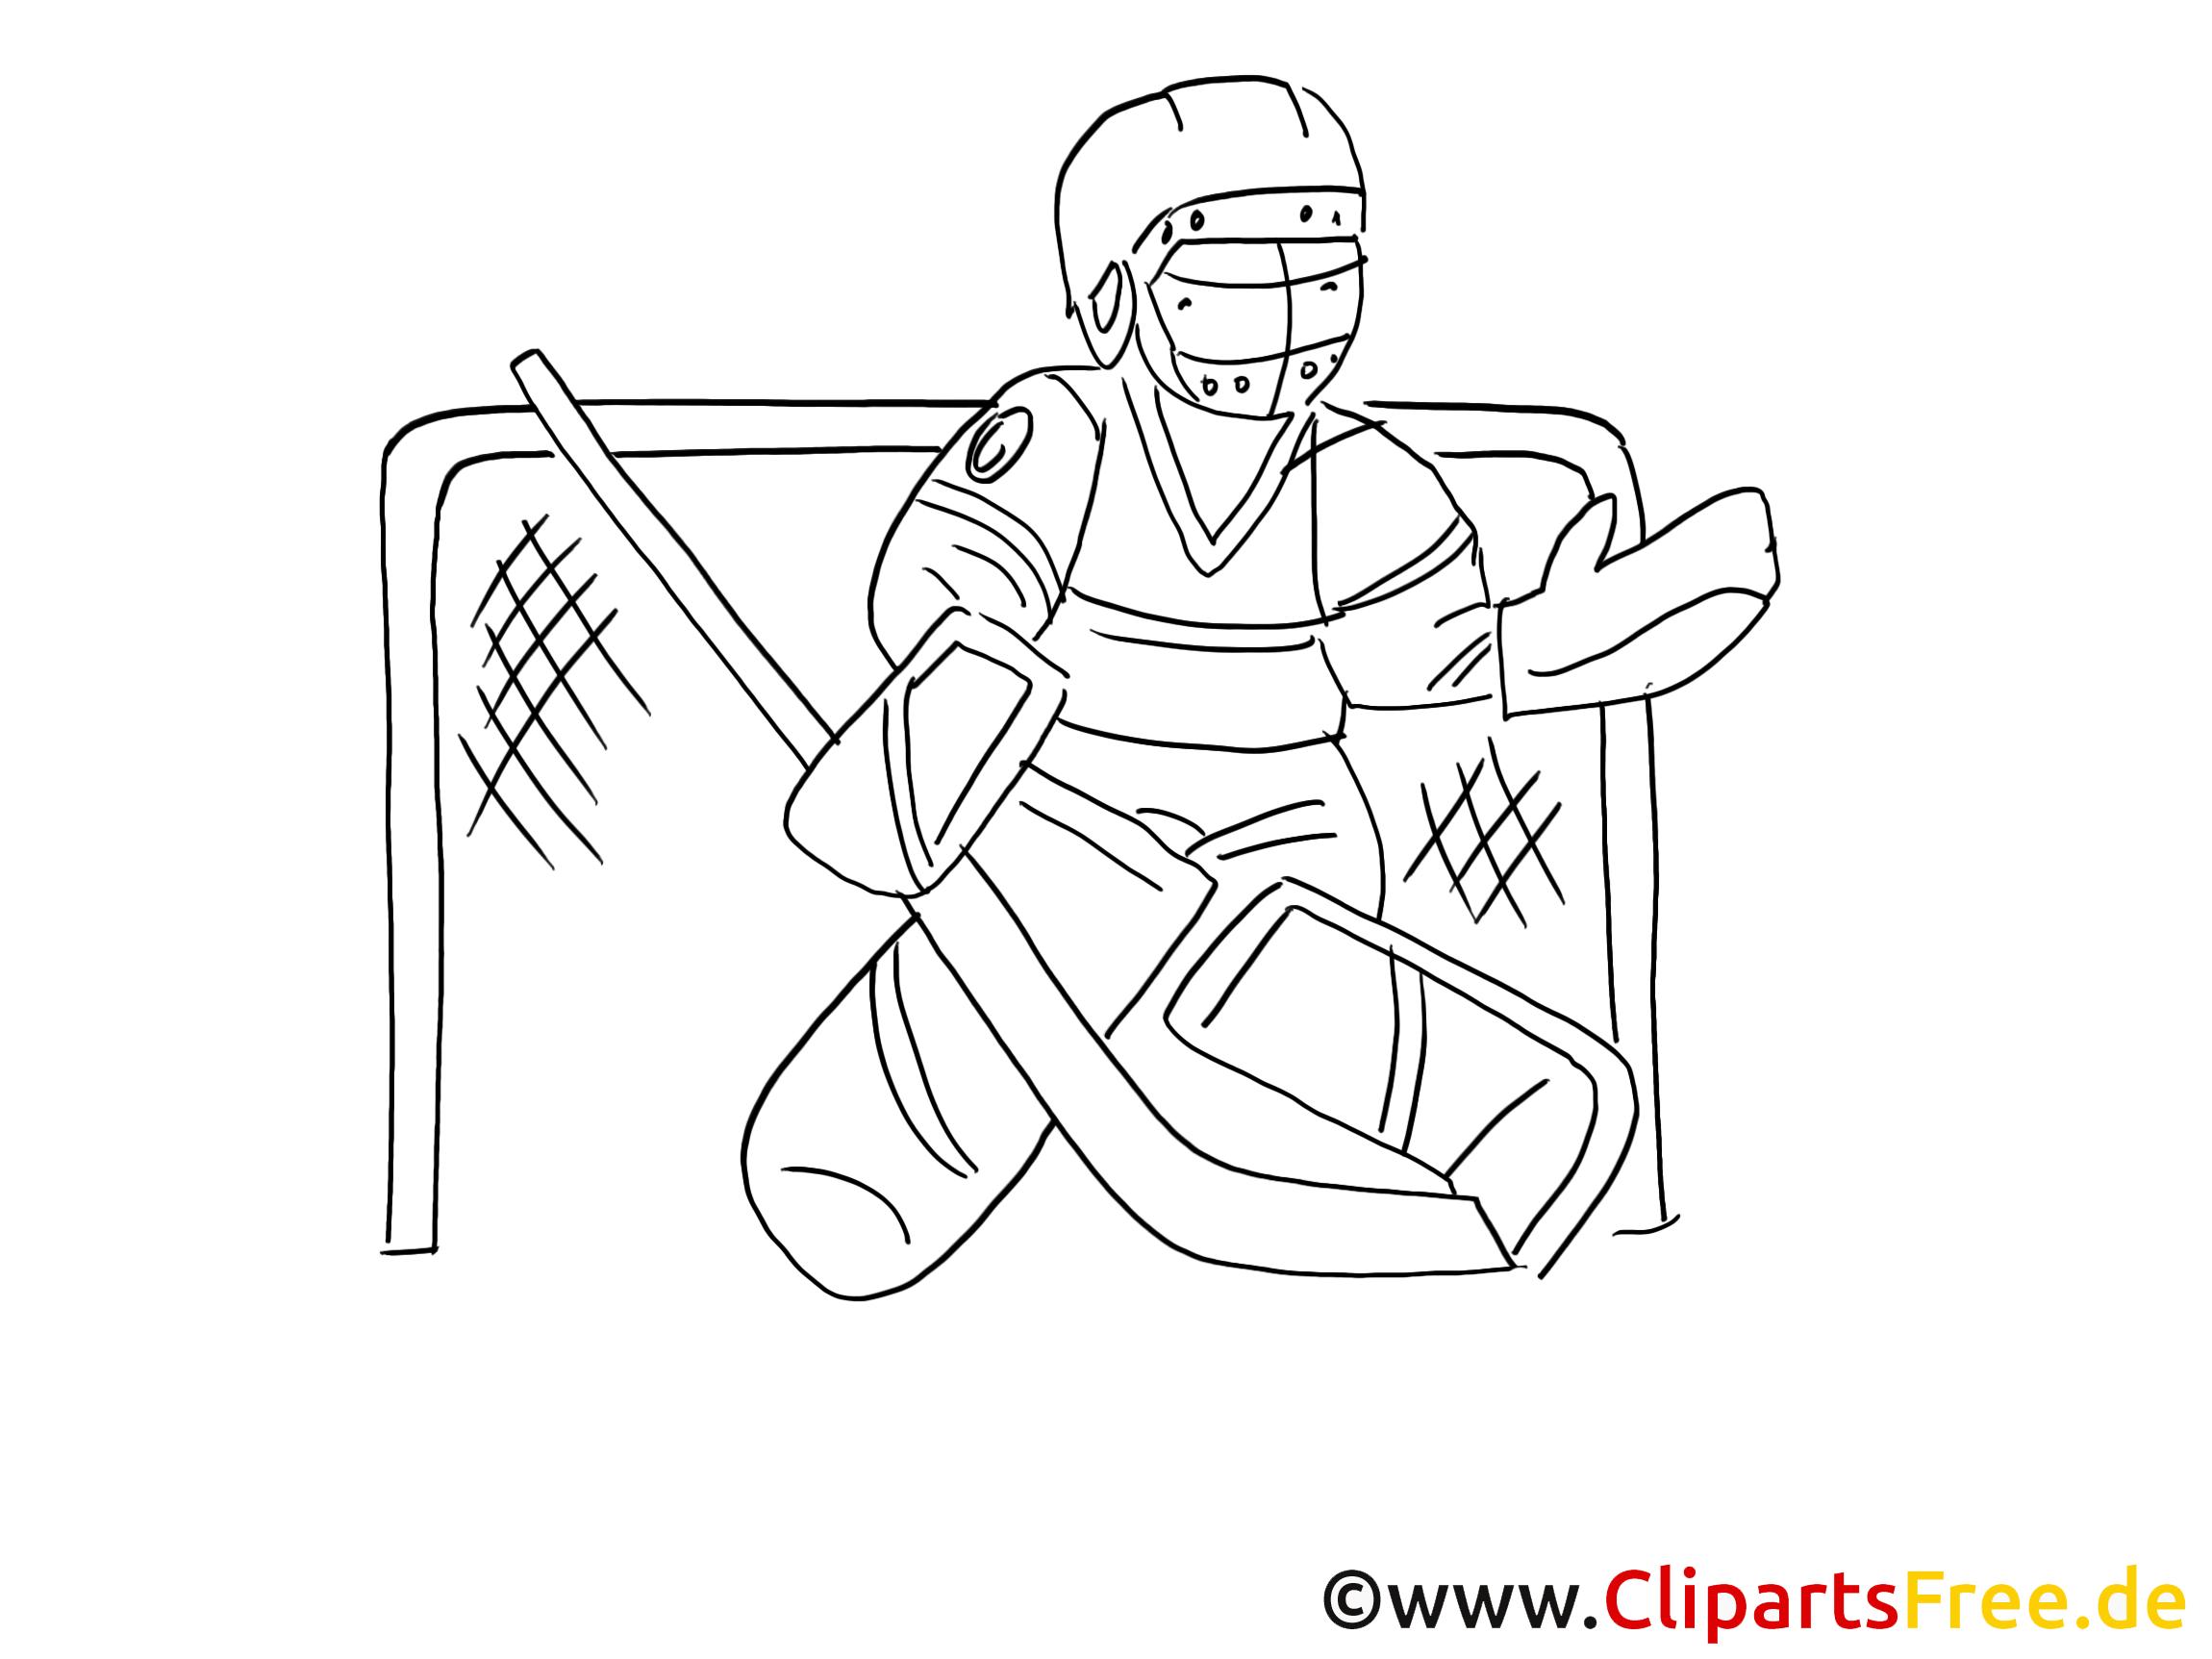 Gardien de but hockey illustration imprimer hockey sur - Gardien de but dessin ...